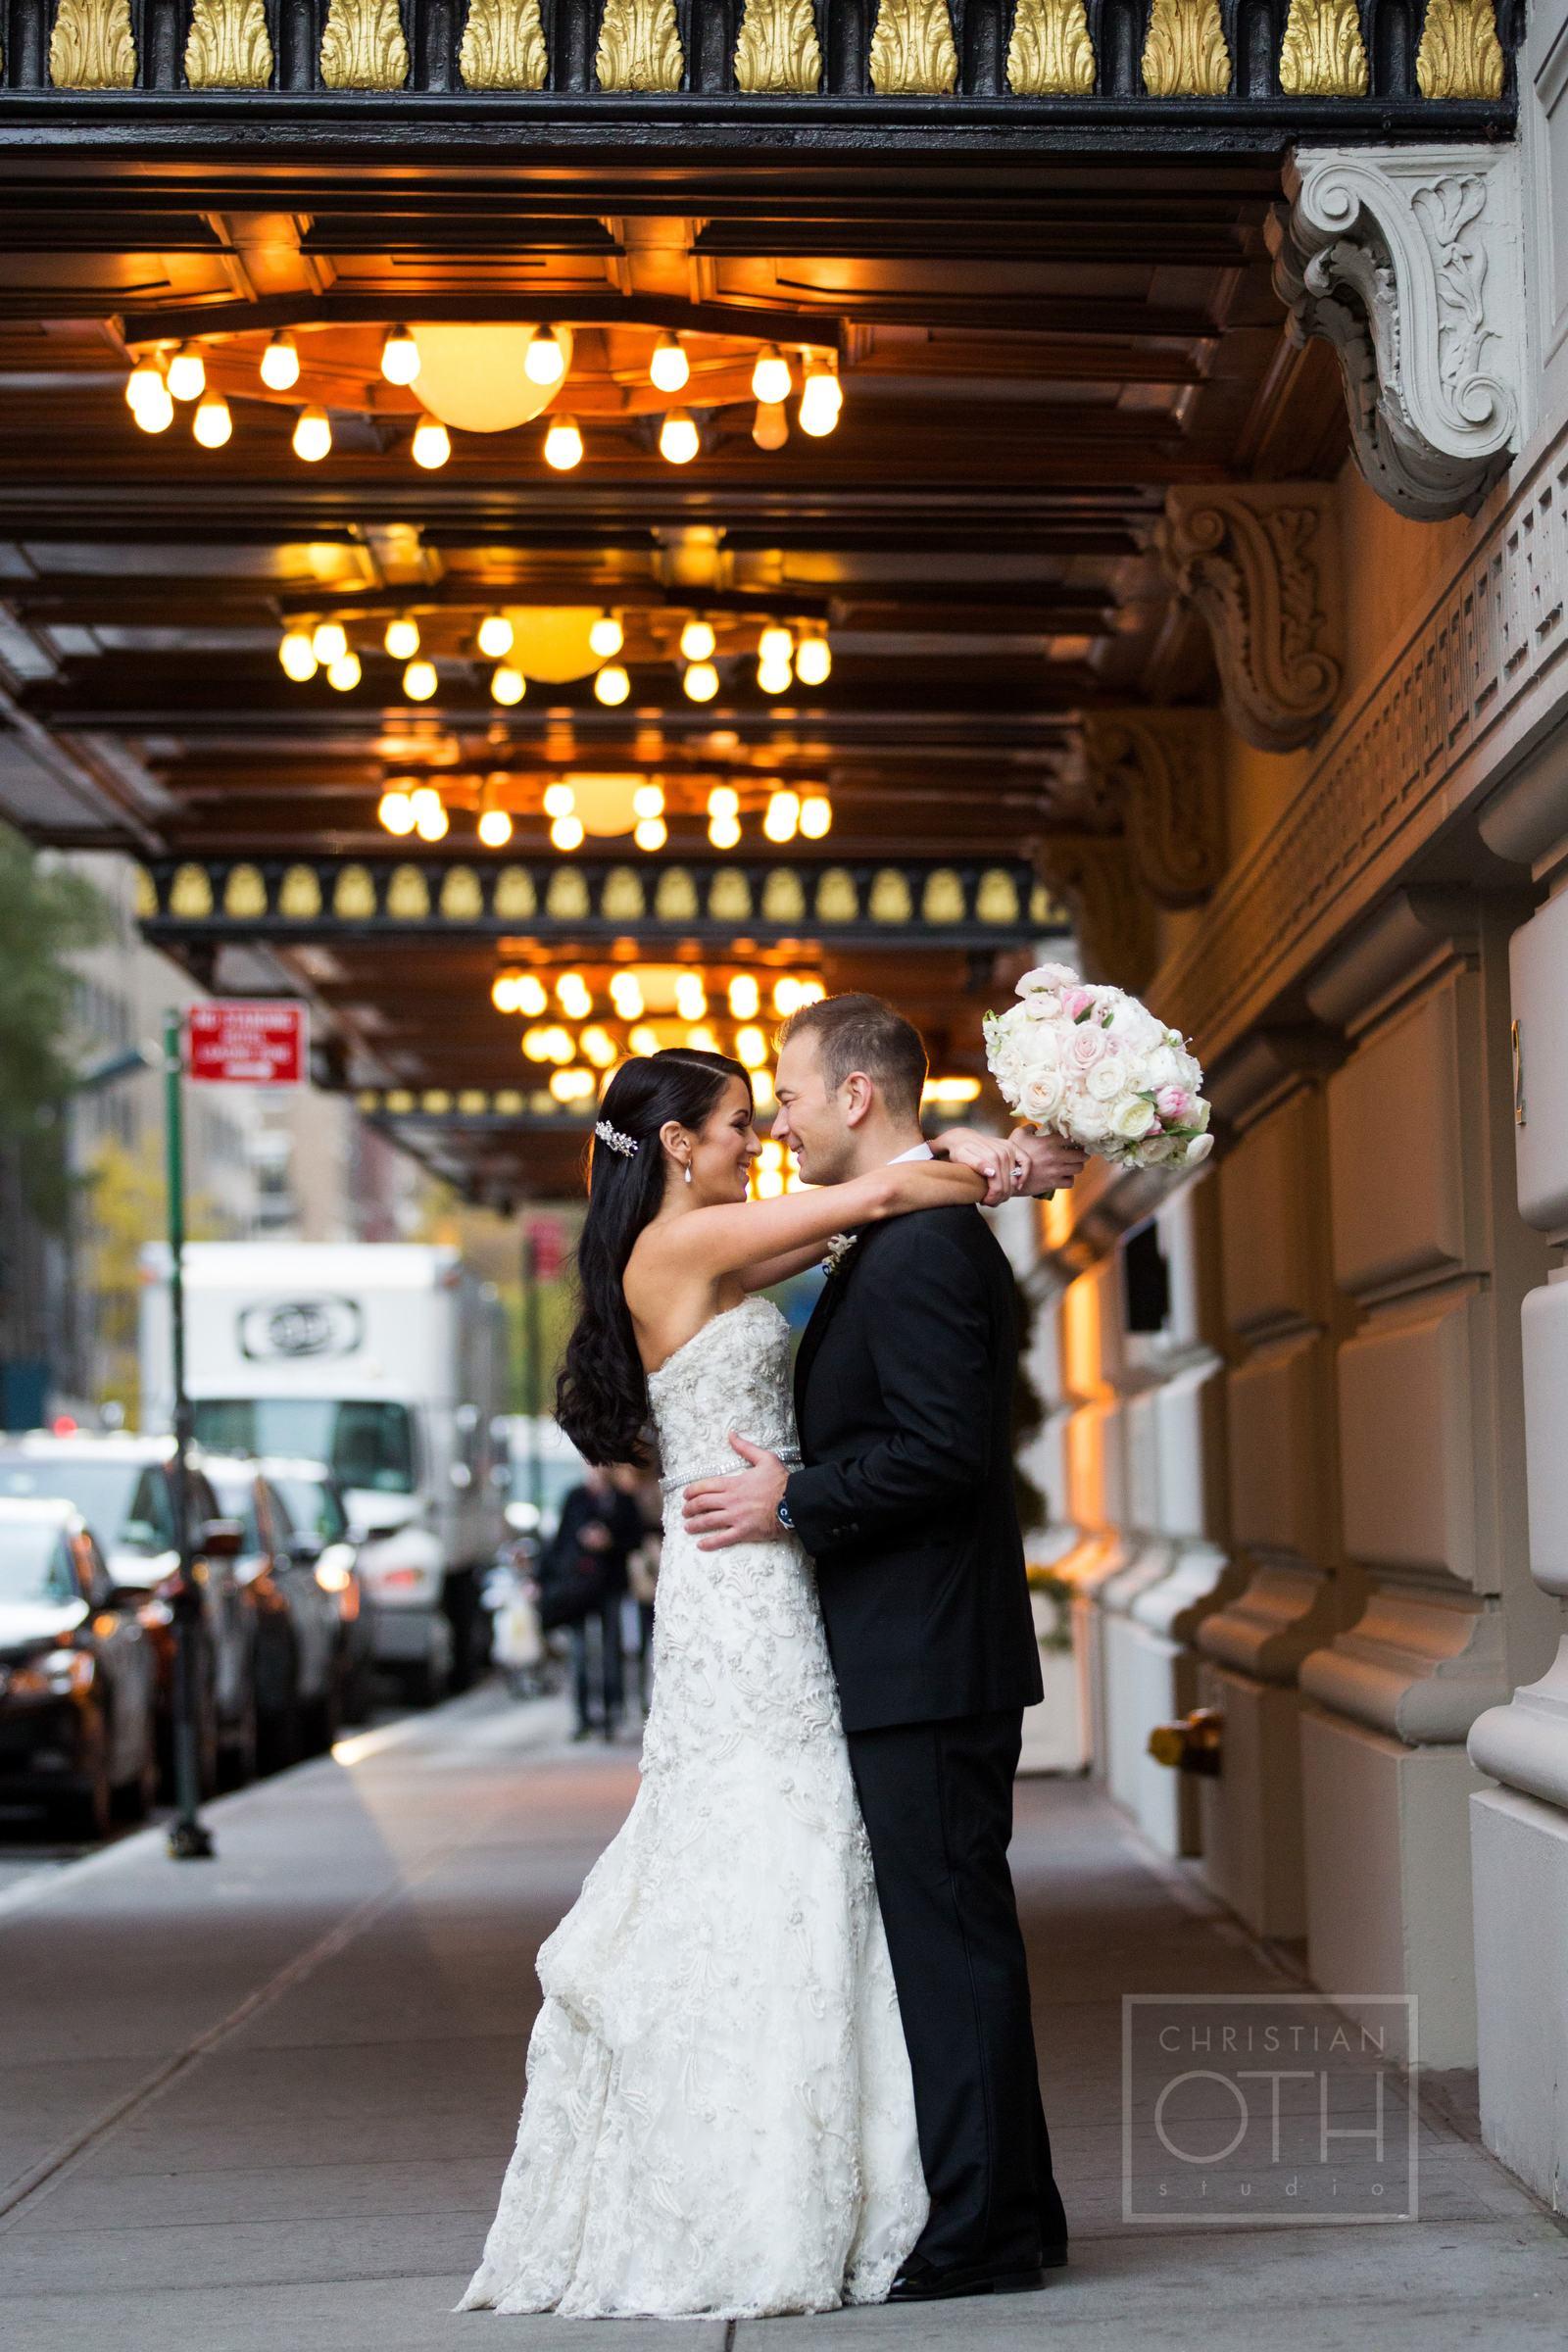 Ceci_New_York_Custom_Invitation_Pierre__City_ Destination_Wedding_Luxury_Personalized_Ceci_Style_Bride_Rose_Gold_Foil_Stamping4.JPG